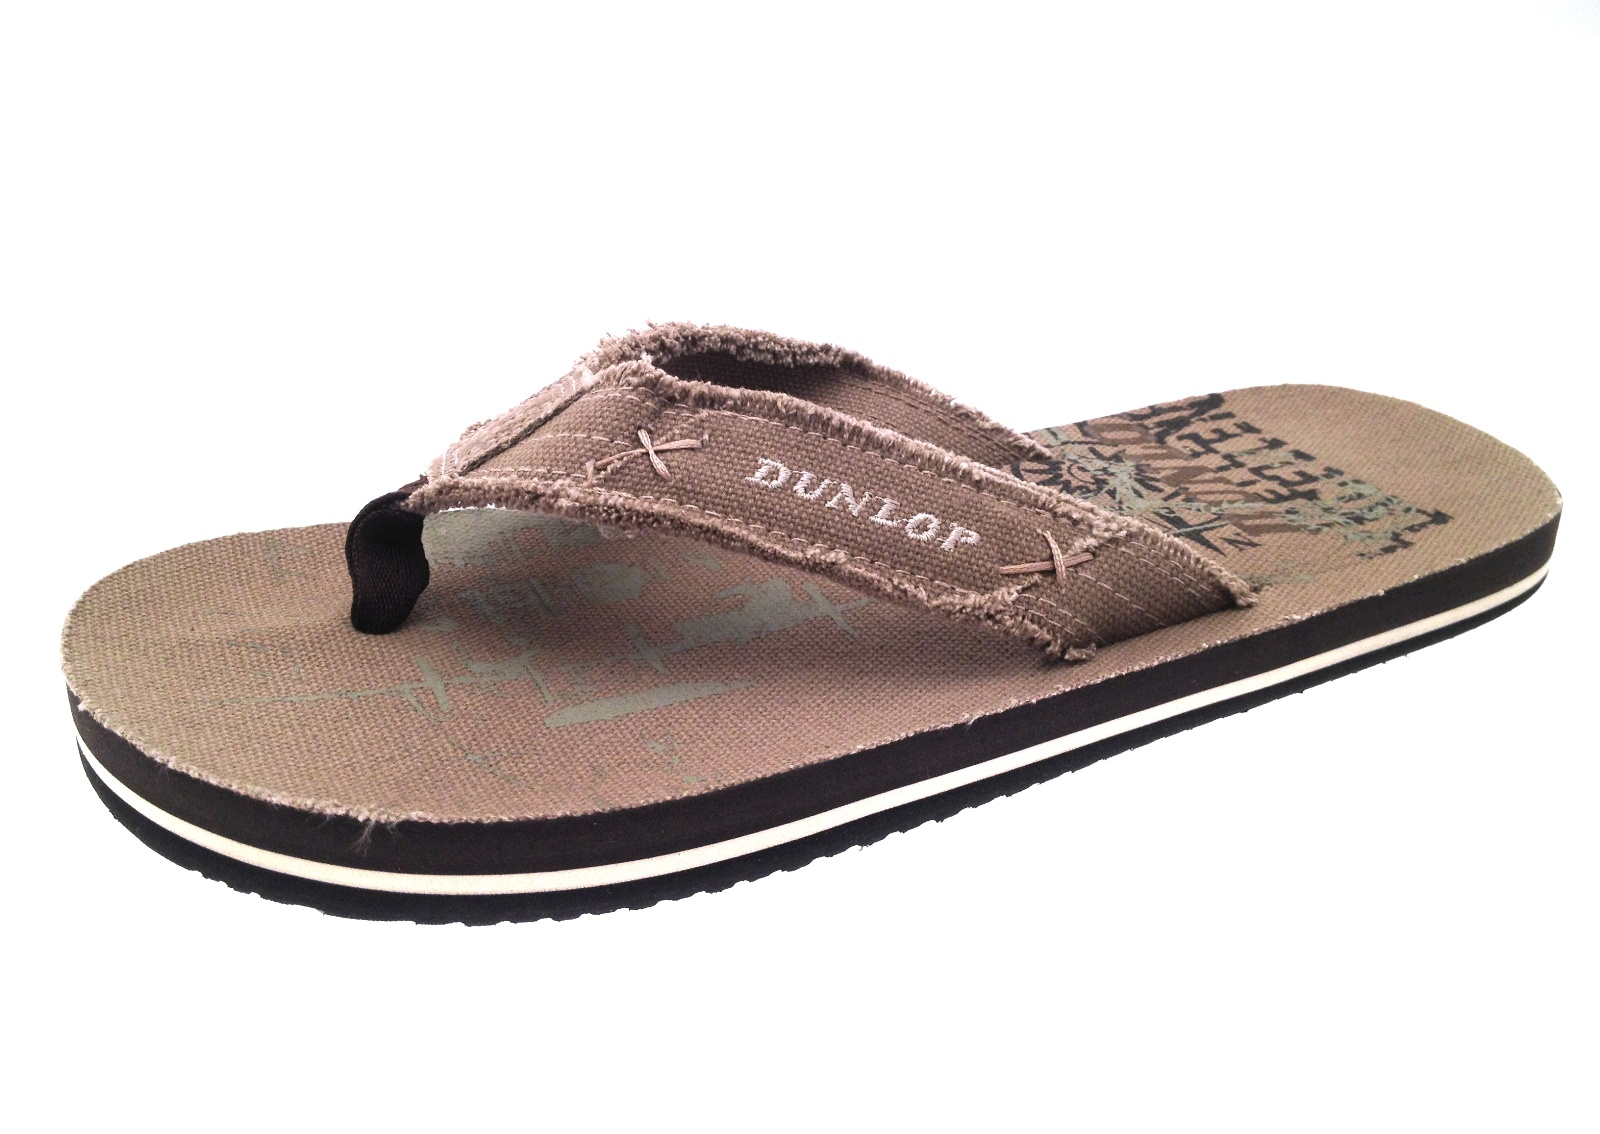 mens lightweight sandals beach flip flops summer canvas. Black Bedroom Furniture Sets. Home Design Ideas